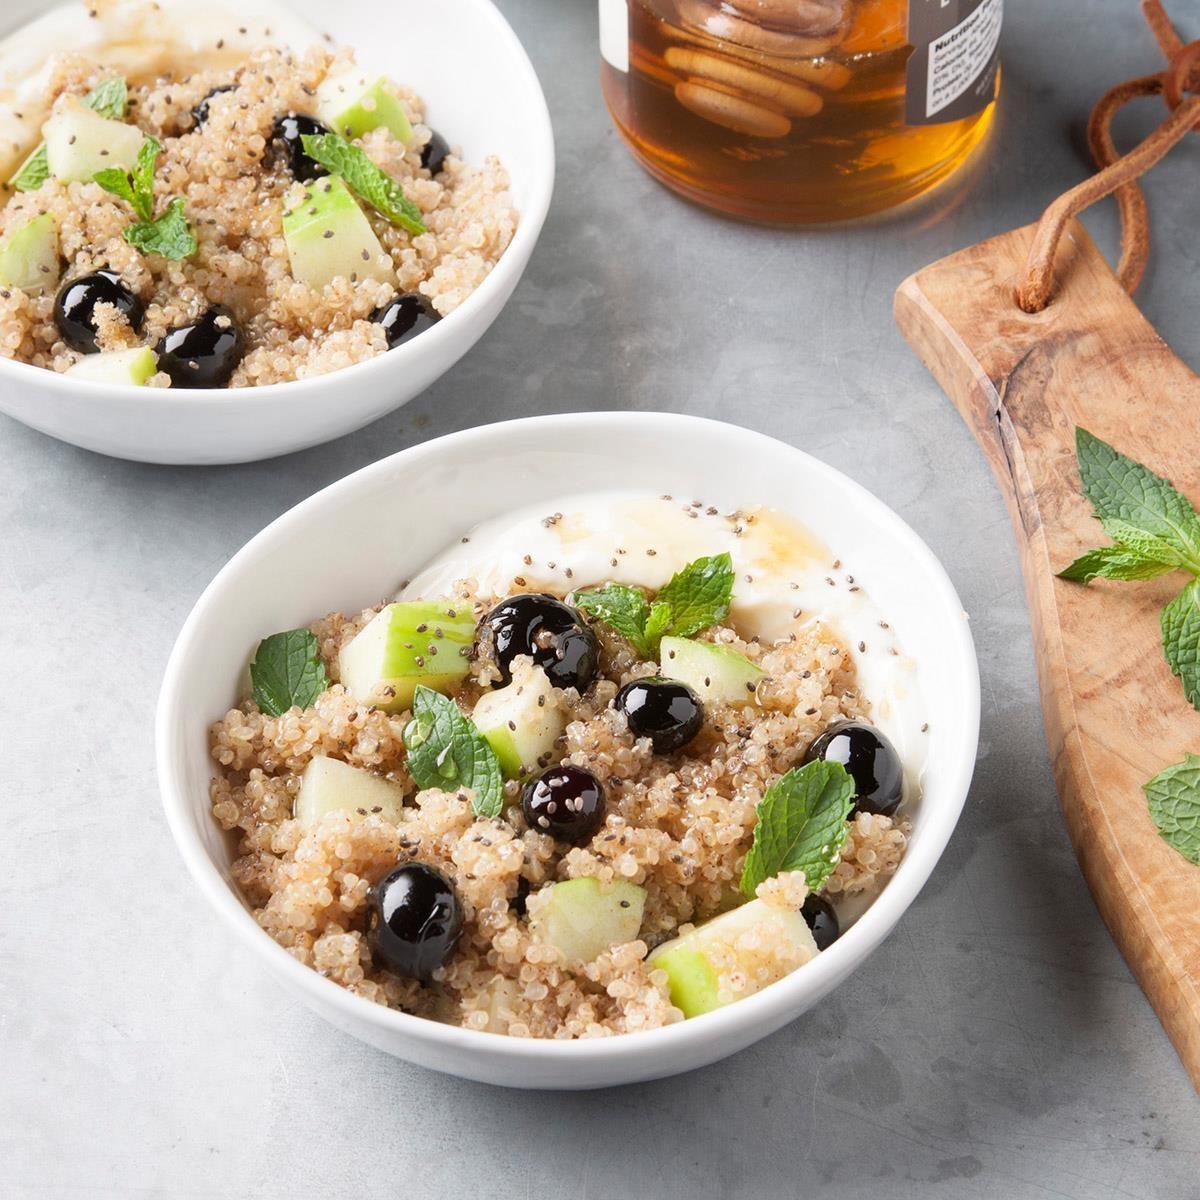 15 Diabetic Breakfast Ideas For Type 2 Diabetes Taste Of Home